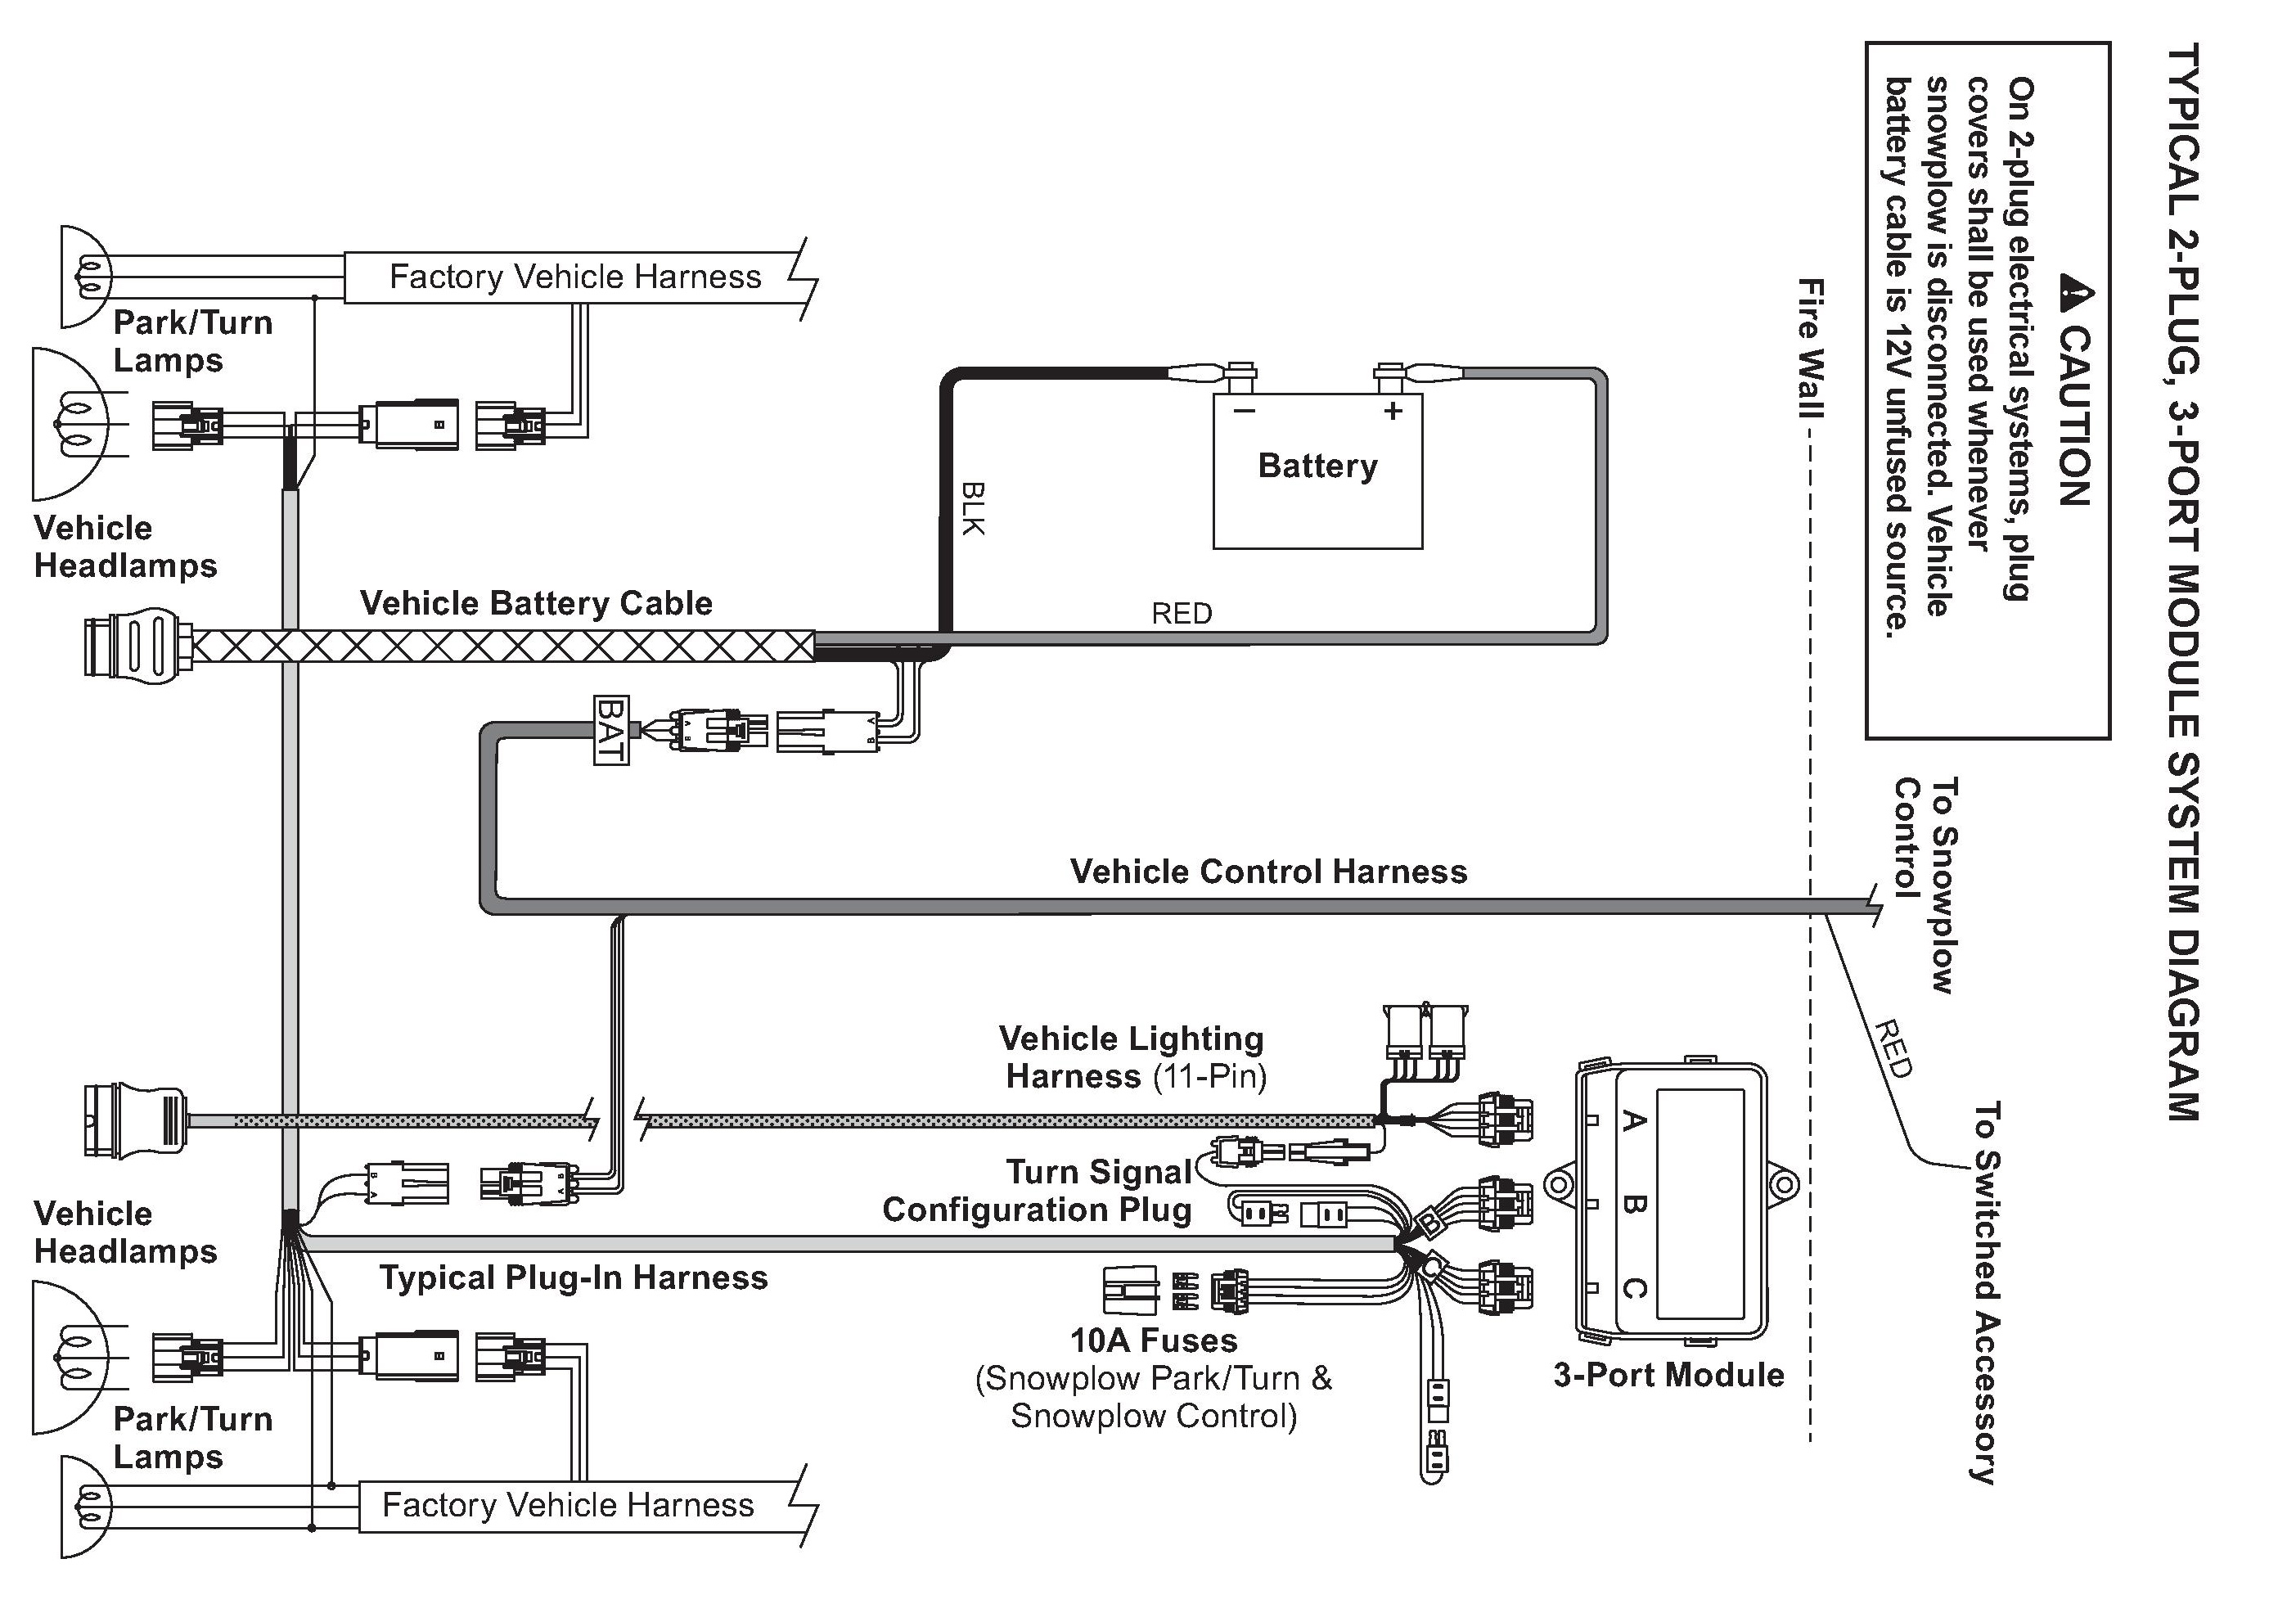 Wiring Diagram Western Snow Plow Wiring Diagram Chevy Boss Plow Wiring